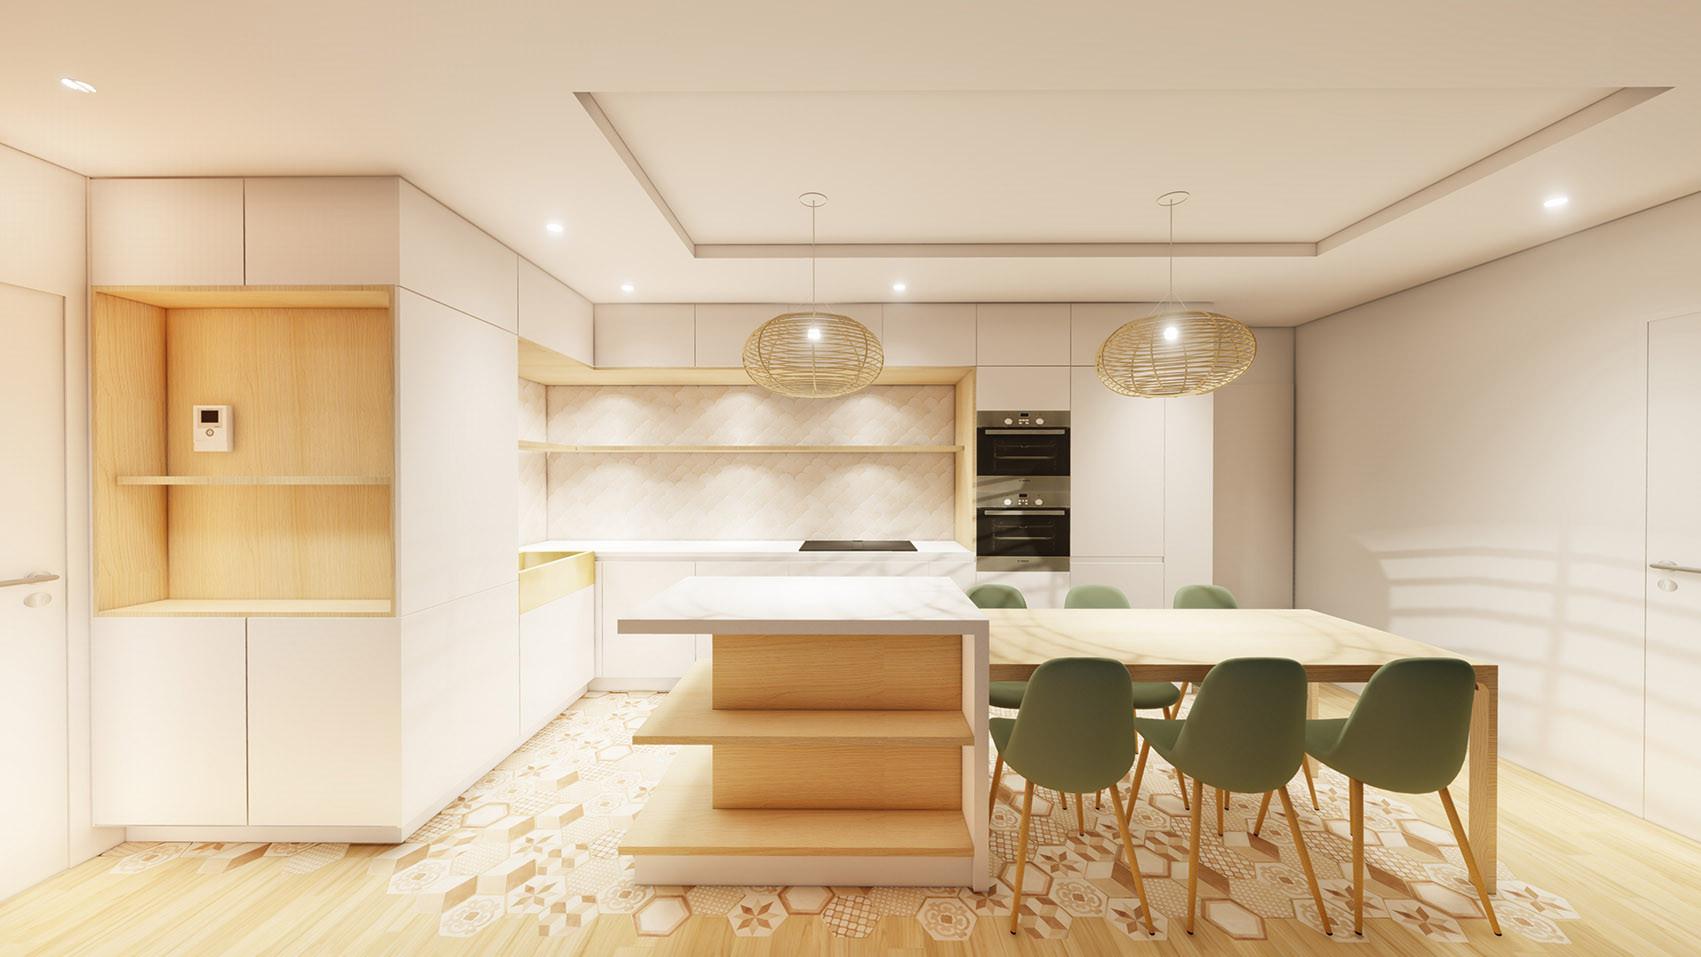 Cuisine ouverte design architecte un arc